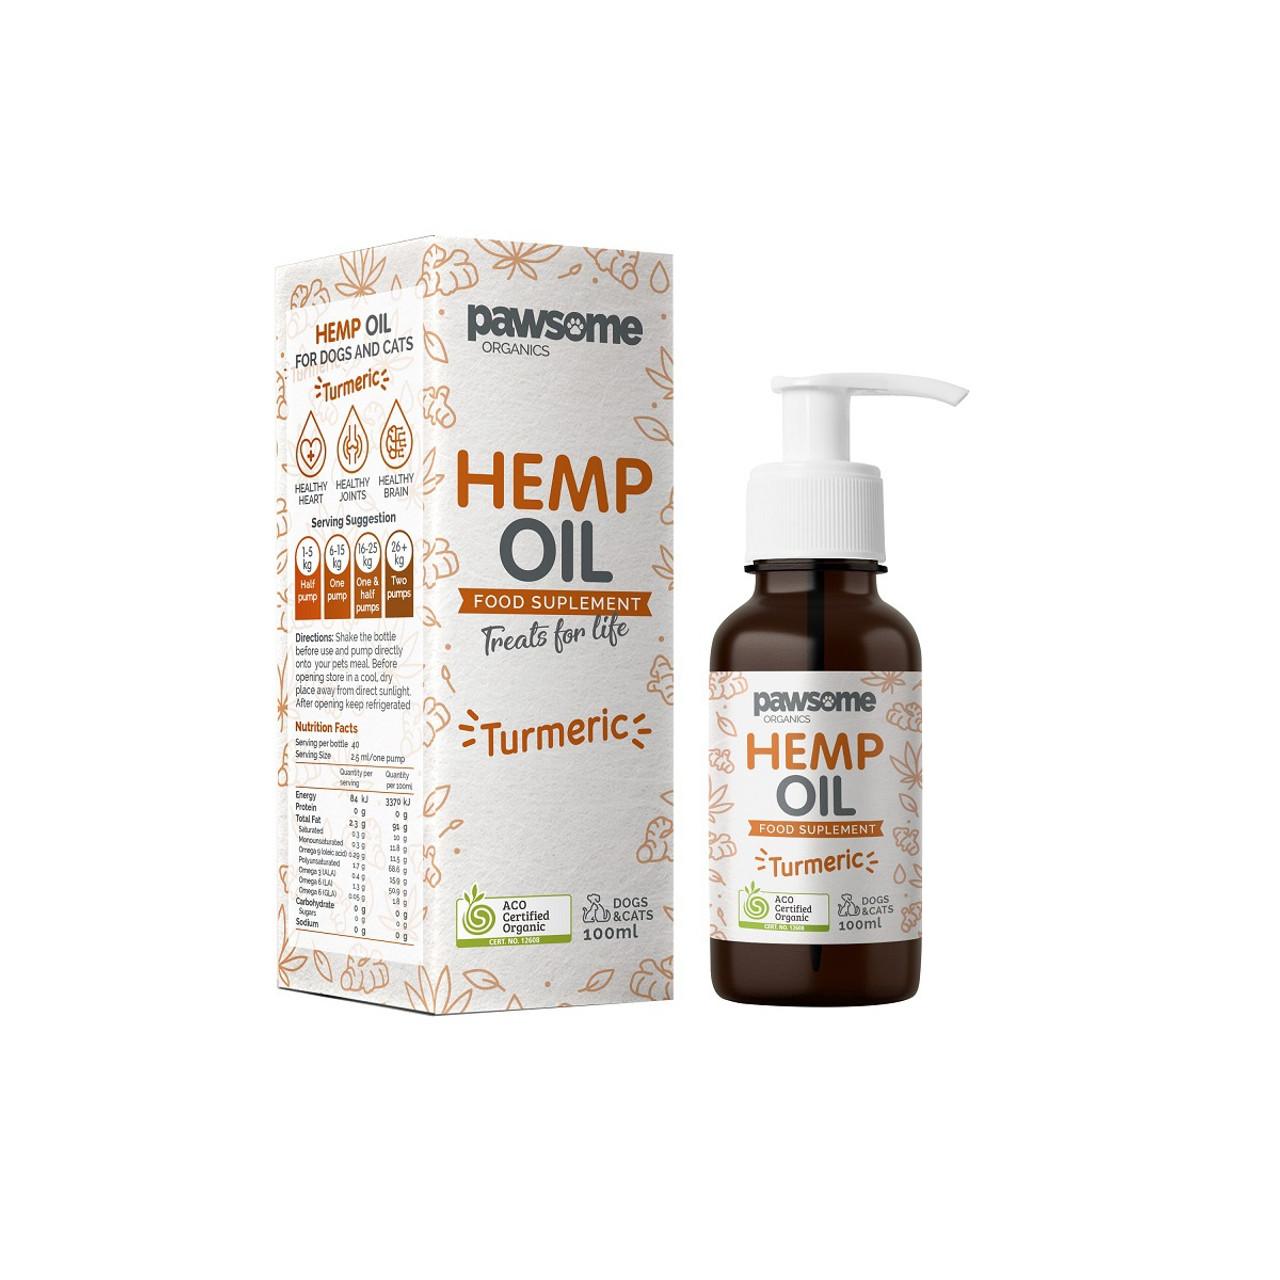 Pawsome Organic Hemp Oil & Turmeric 100ml